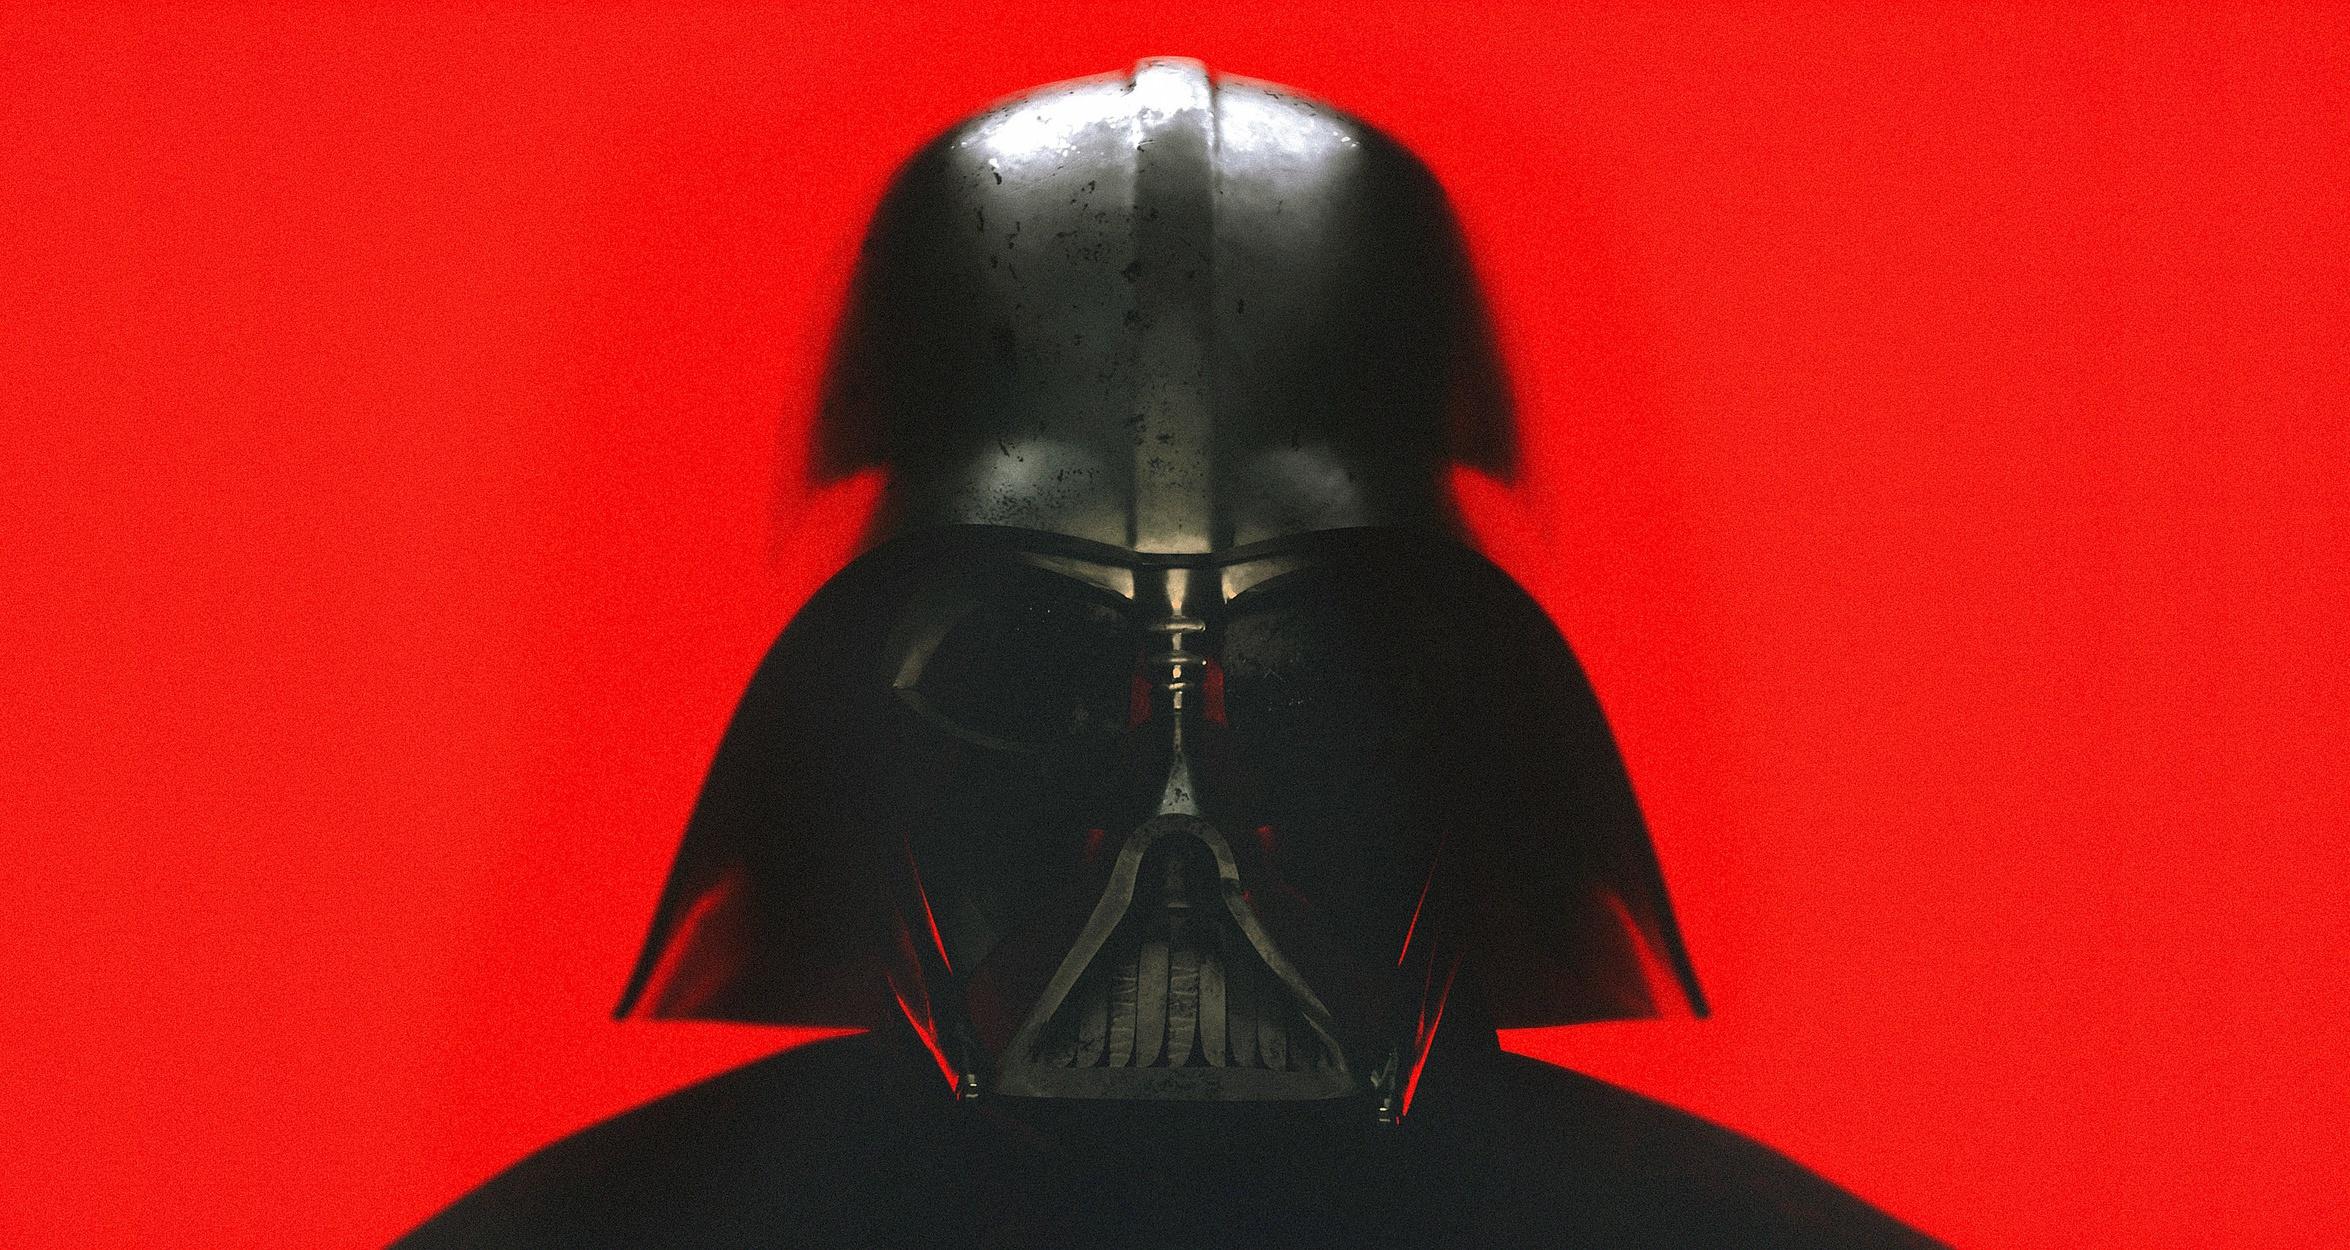 darth vader star wars red background